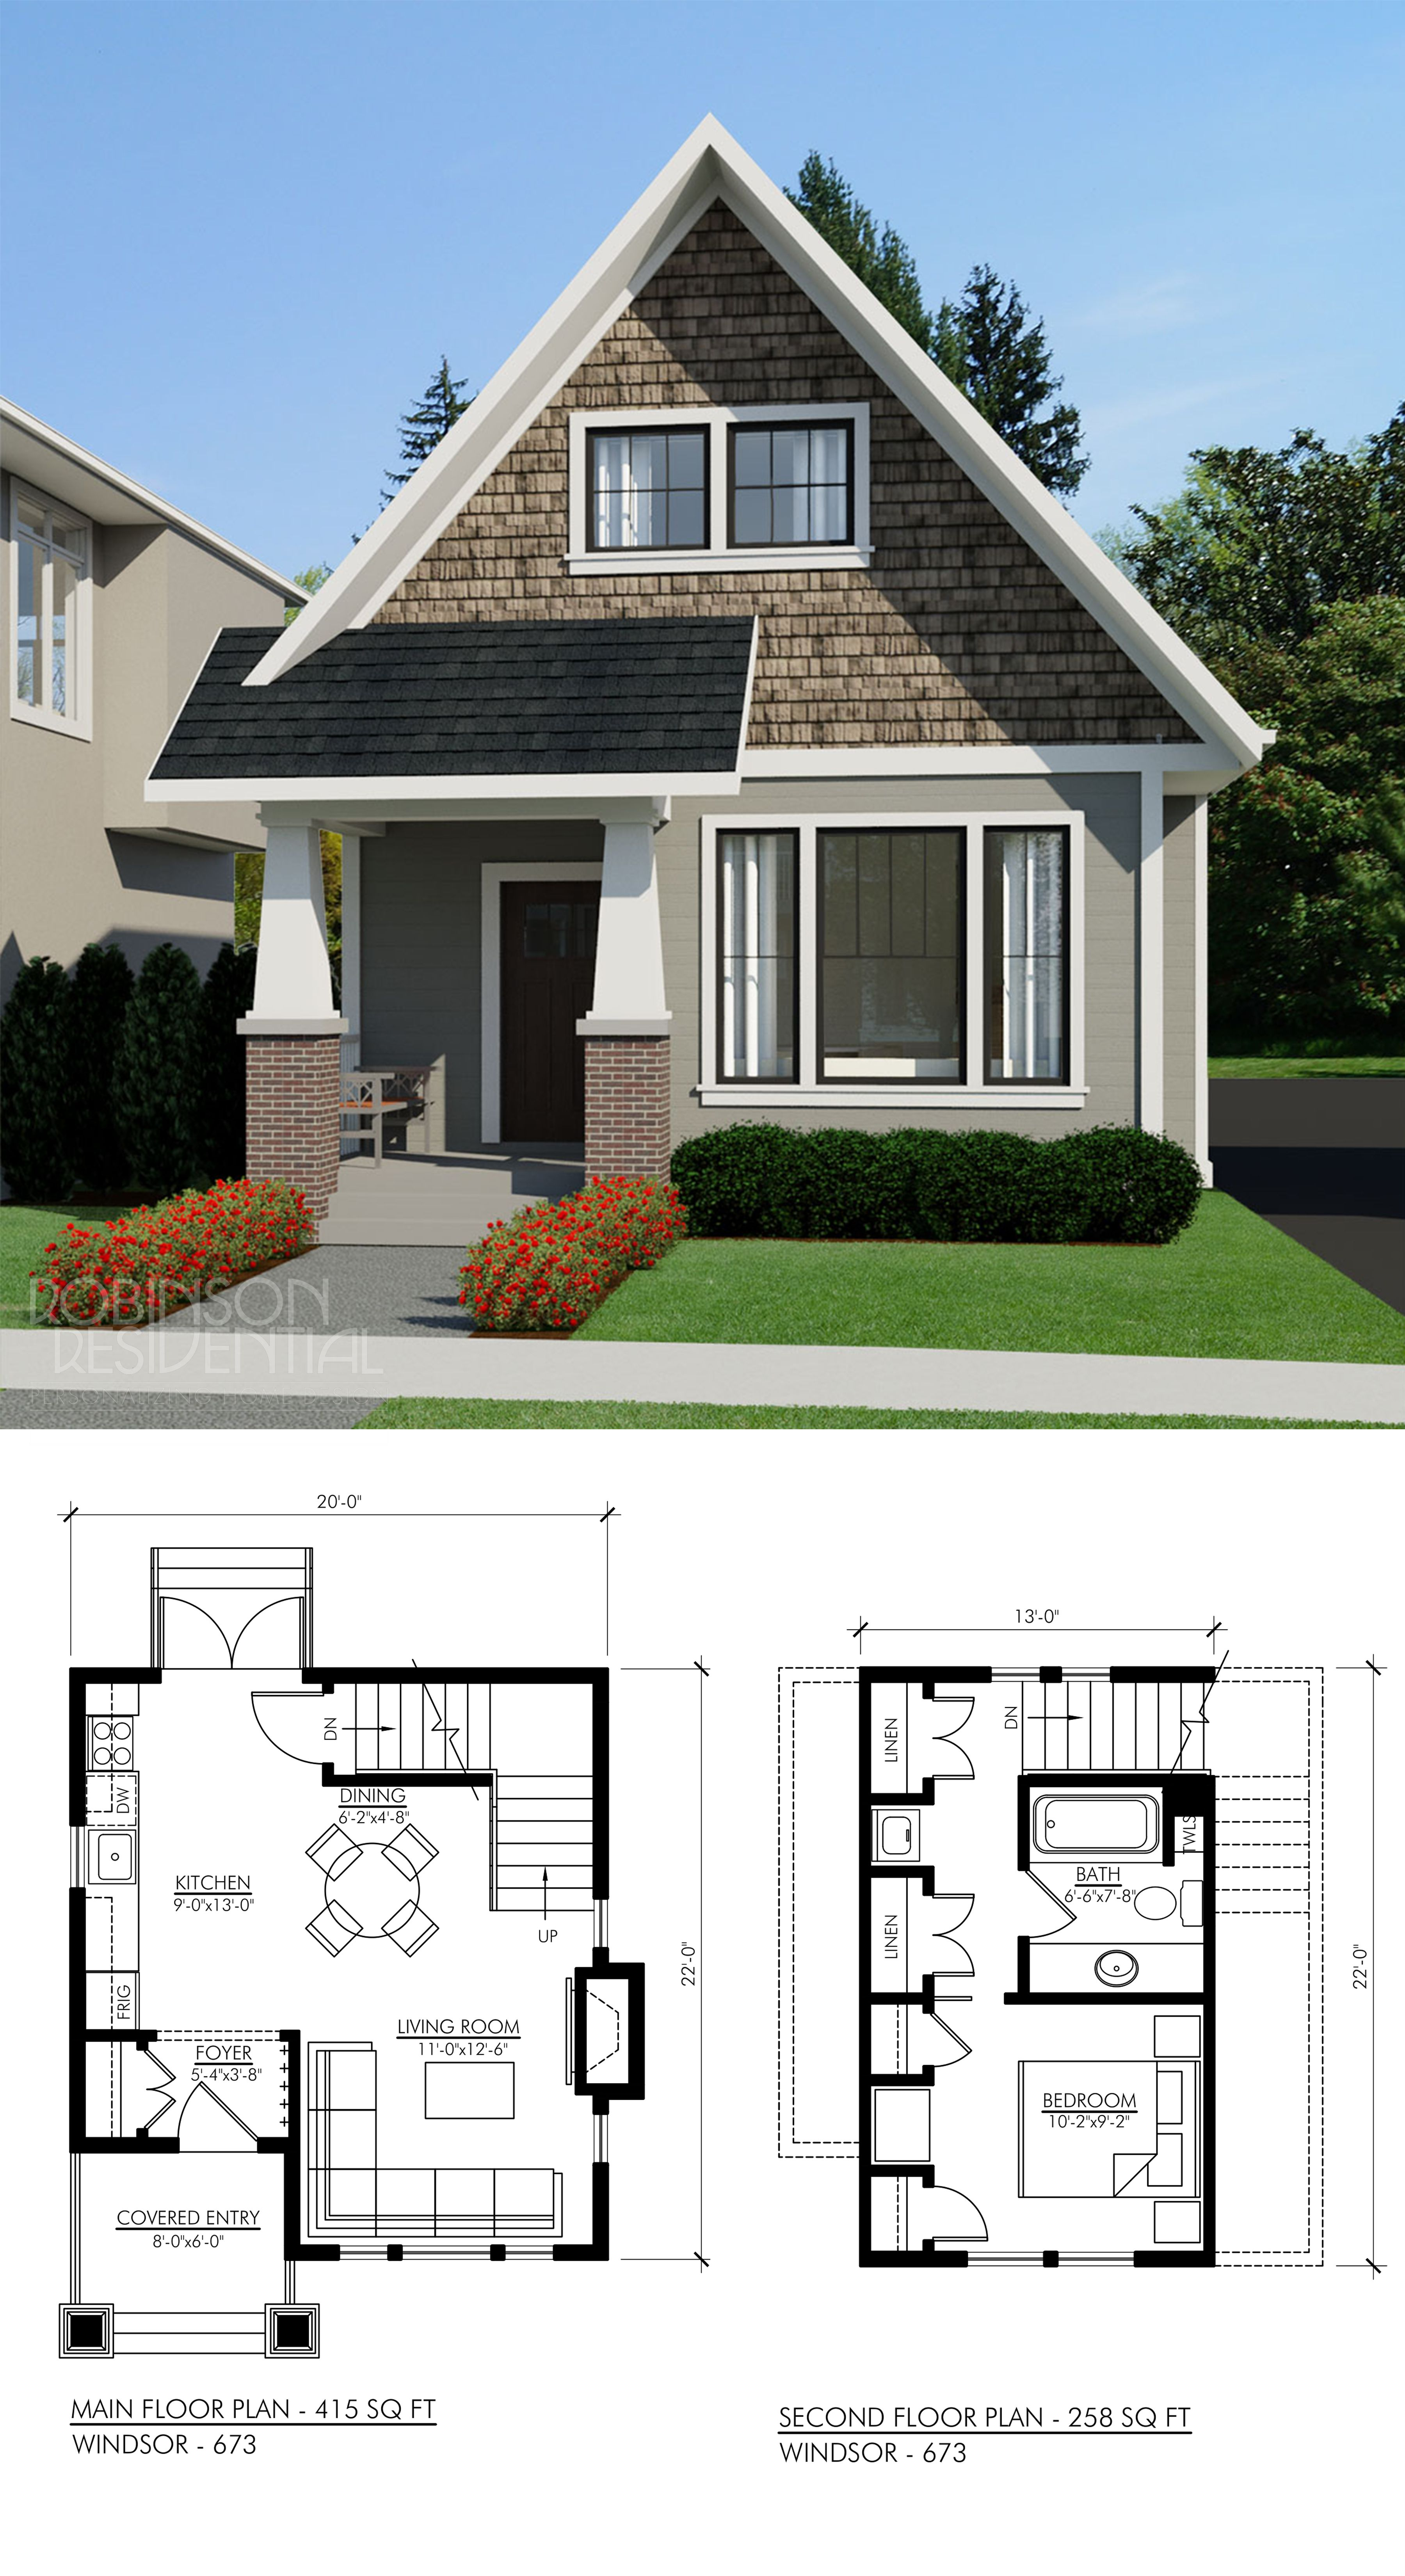 Tiny Home Designs: Craftsman Windsor-694 In 2019